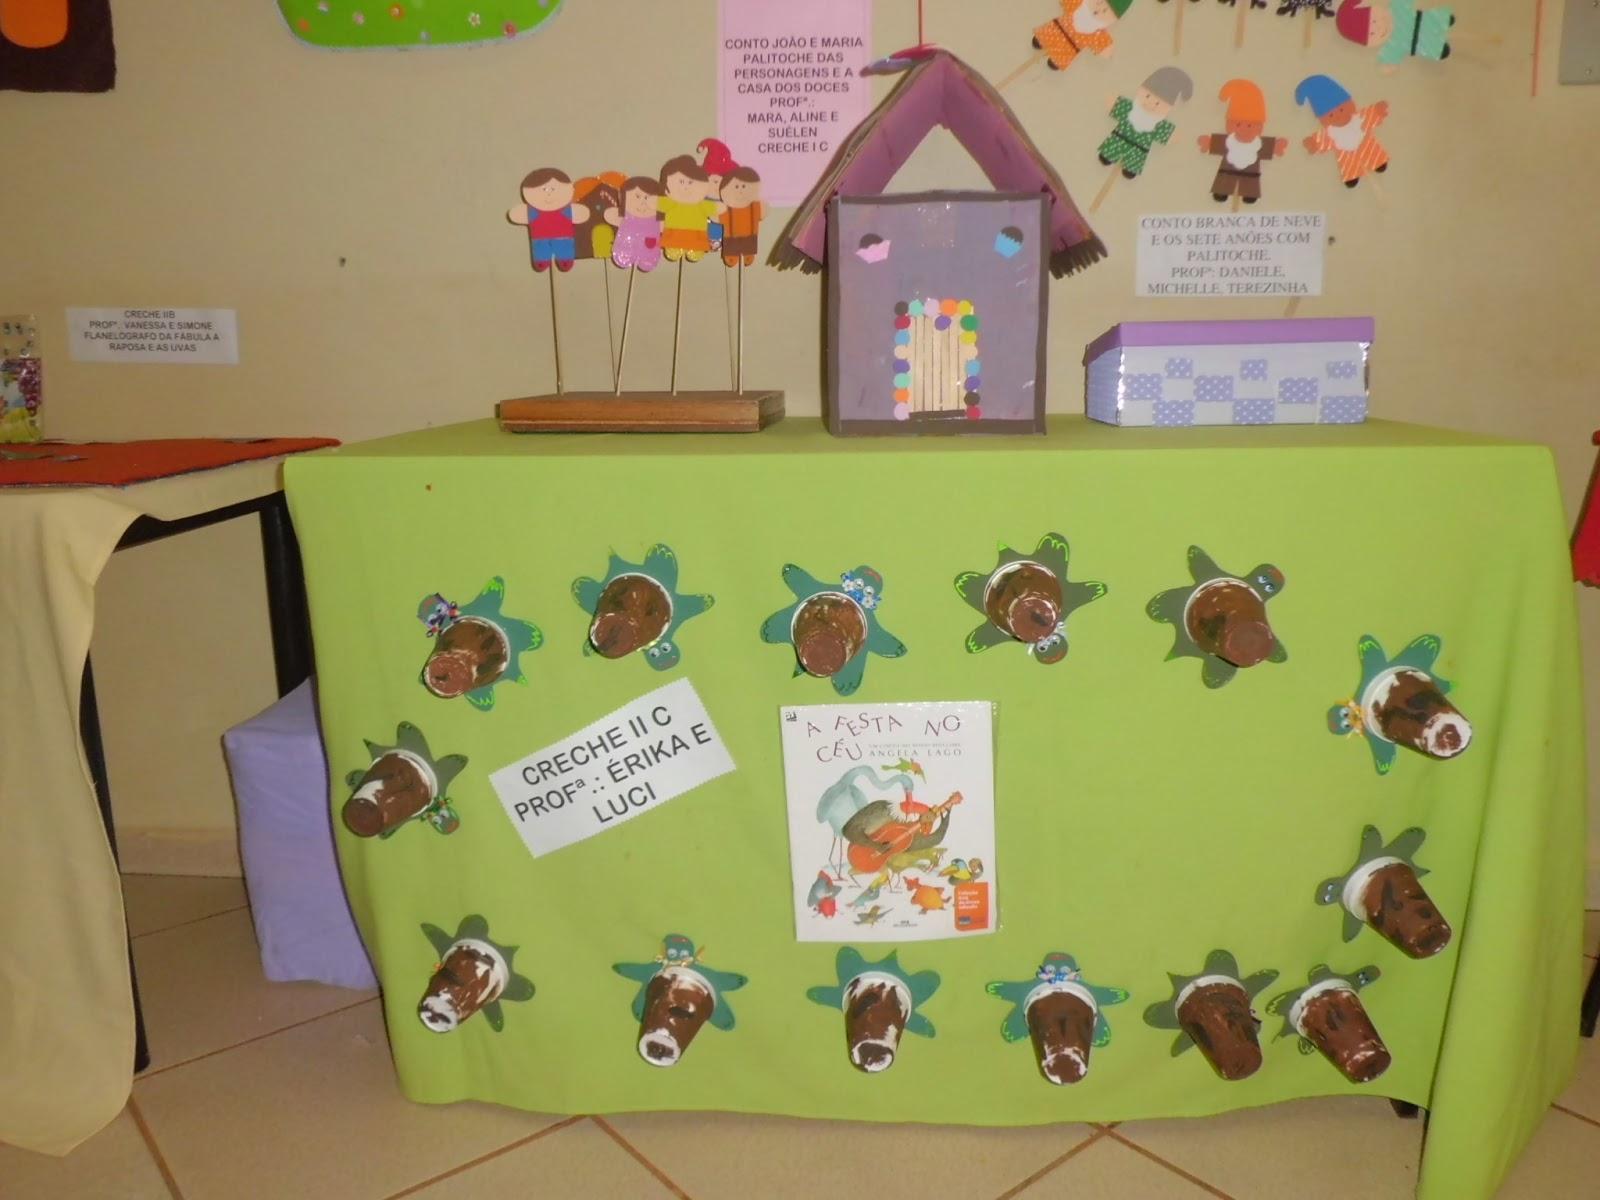 #6F4329  SABERES NA EDUCAÇÃO INFANTIL***: PROJETO LITERATURA INFANTIL 1600x1200 px Projeto Cozinha Na Educação Infantil_4295 Imagens